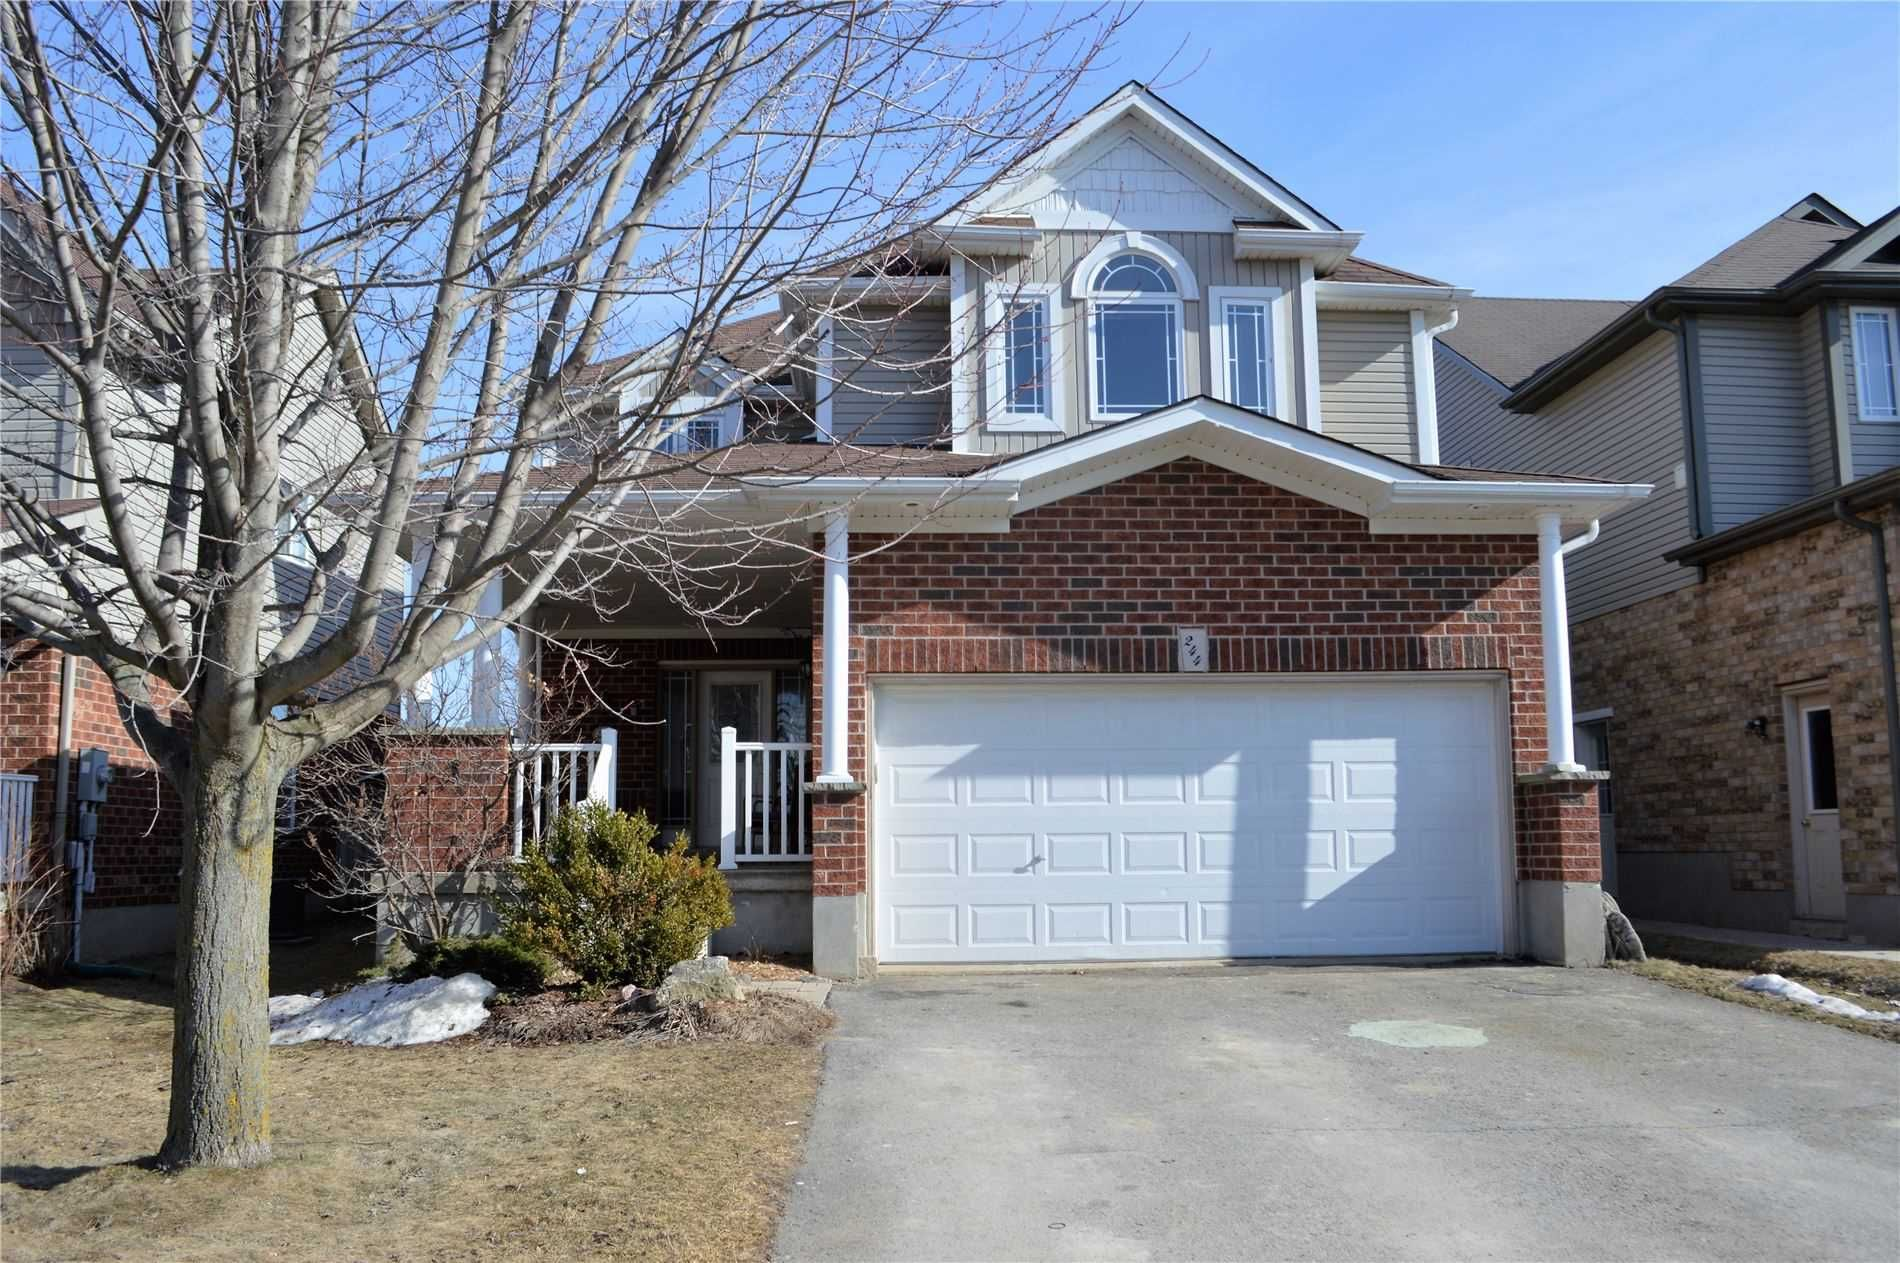 Main Photo: 244 Elderberry Street: Orangeville House (2-Storey) for sale : MLS®# W5182868